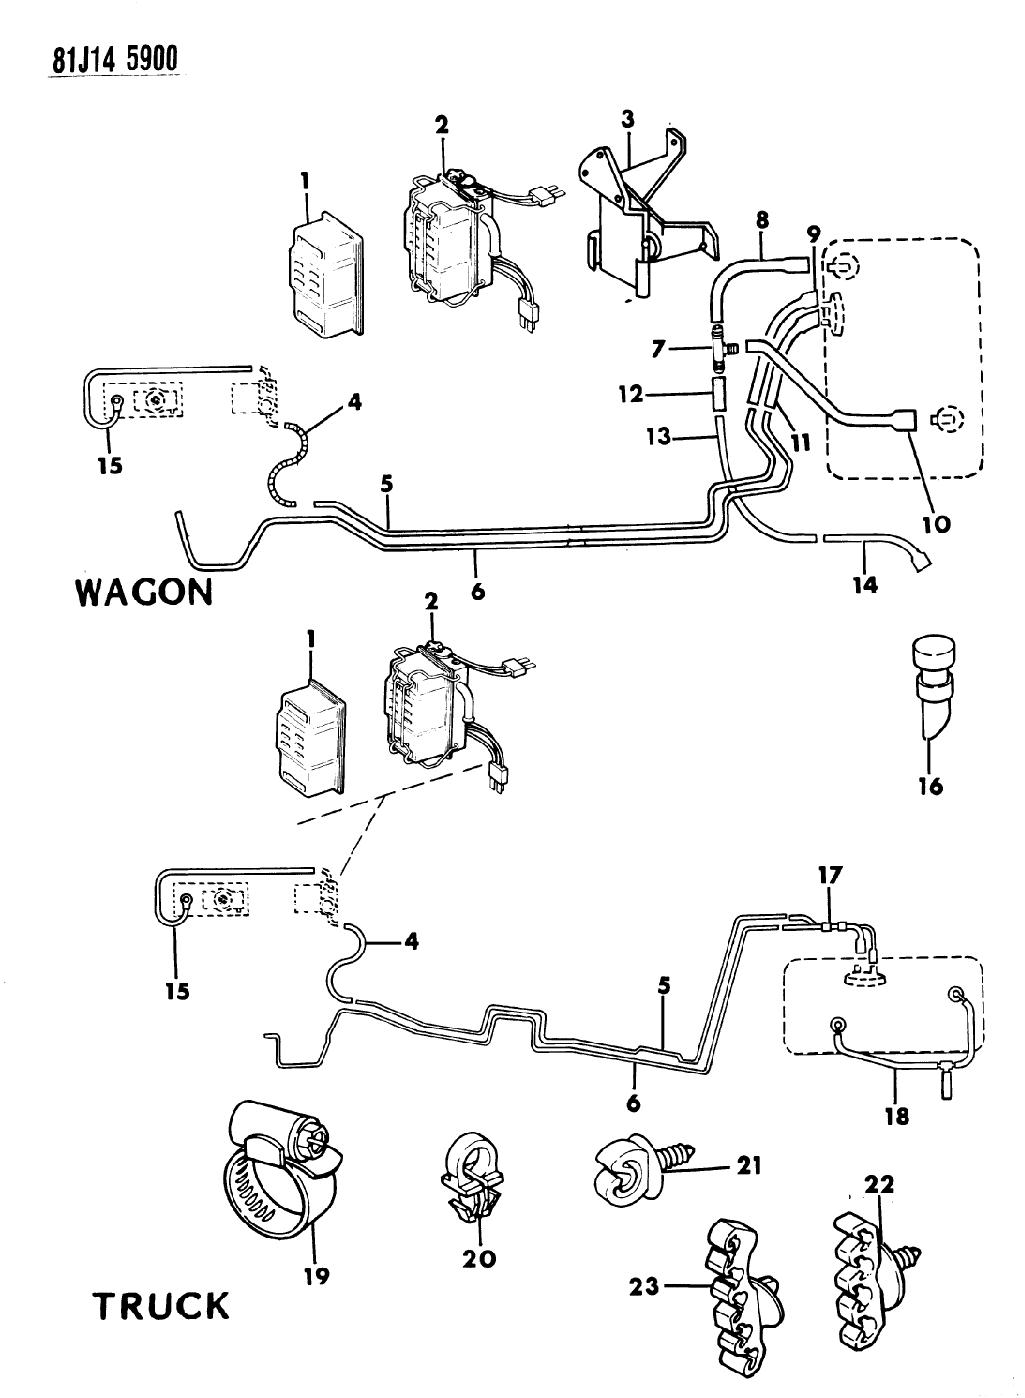 1986 Jeep Wagoneer Fuel Line